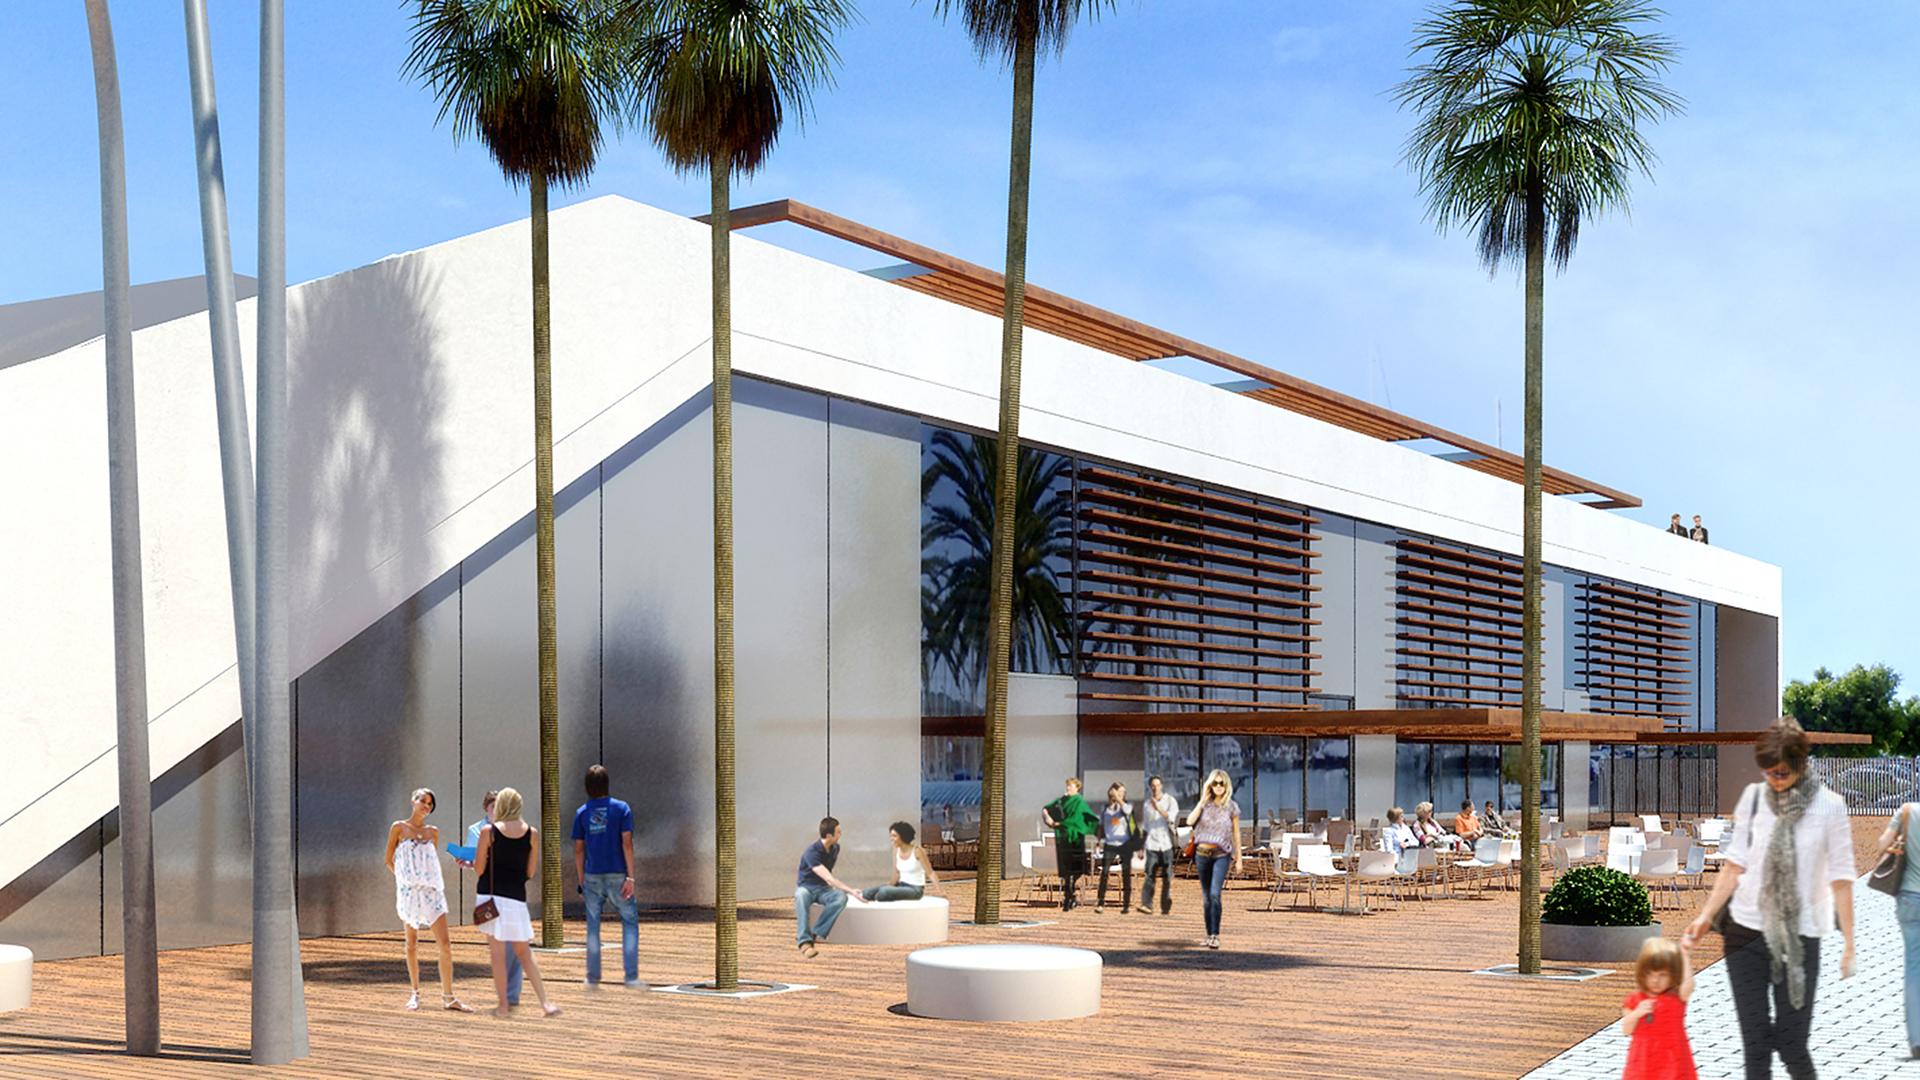 Sct estudio de arquitectura ficha del proyecto - Estudio palma de mallorca ...